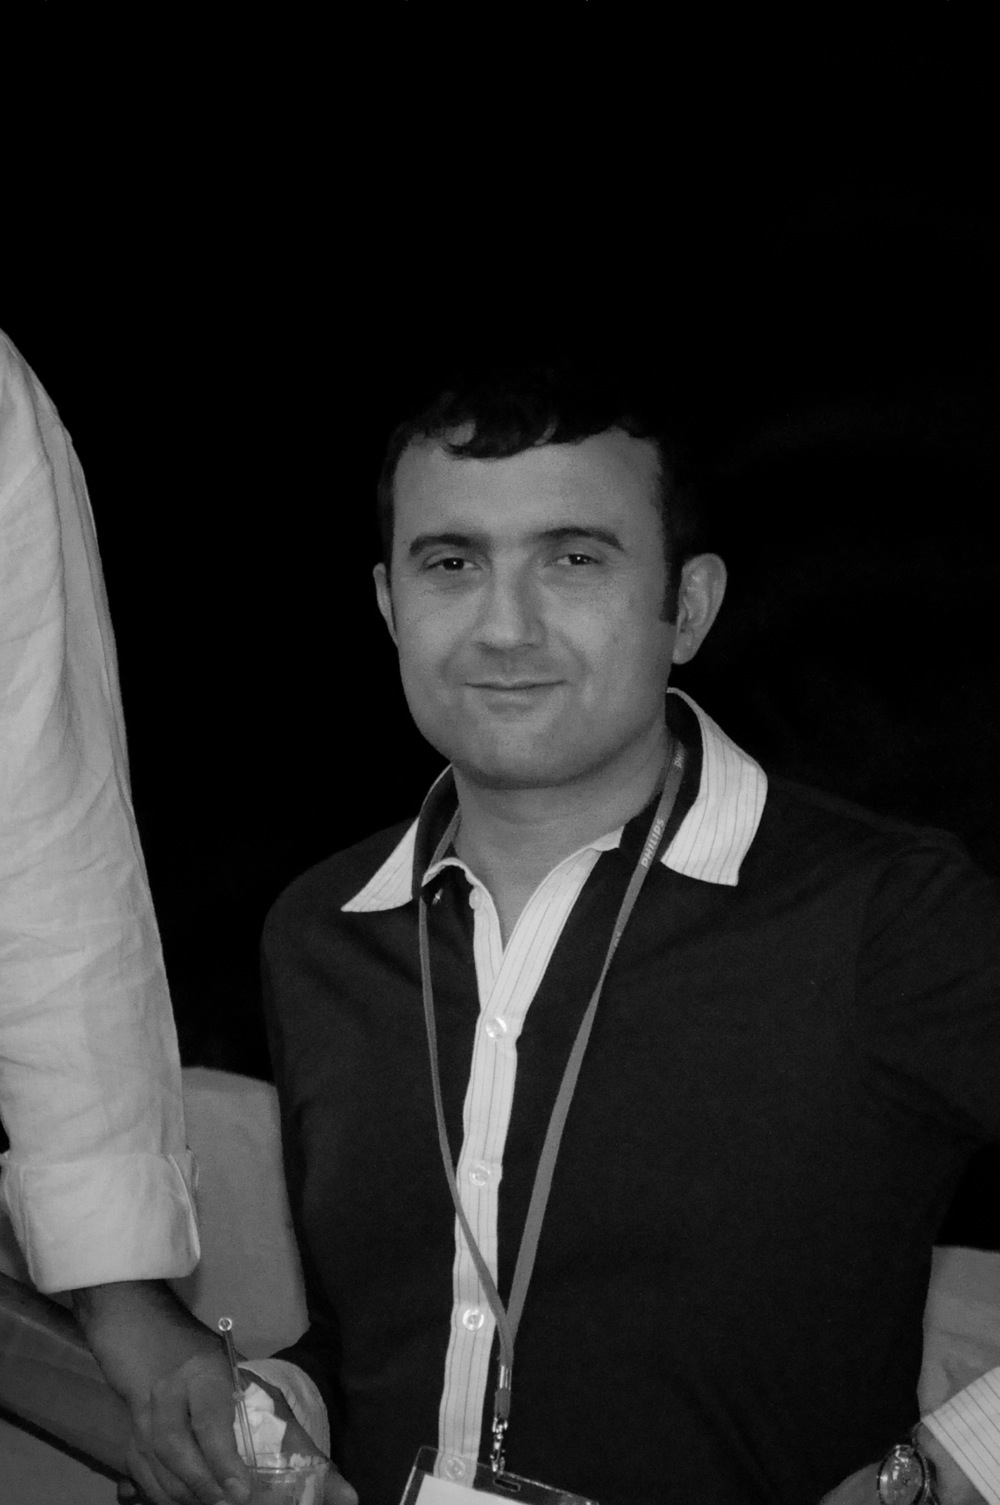 20111027-DSC_0223.jpg